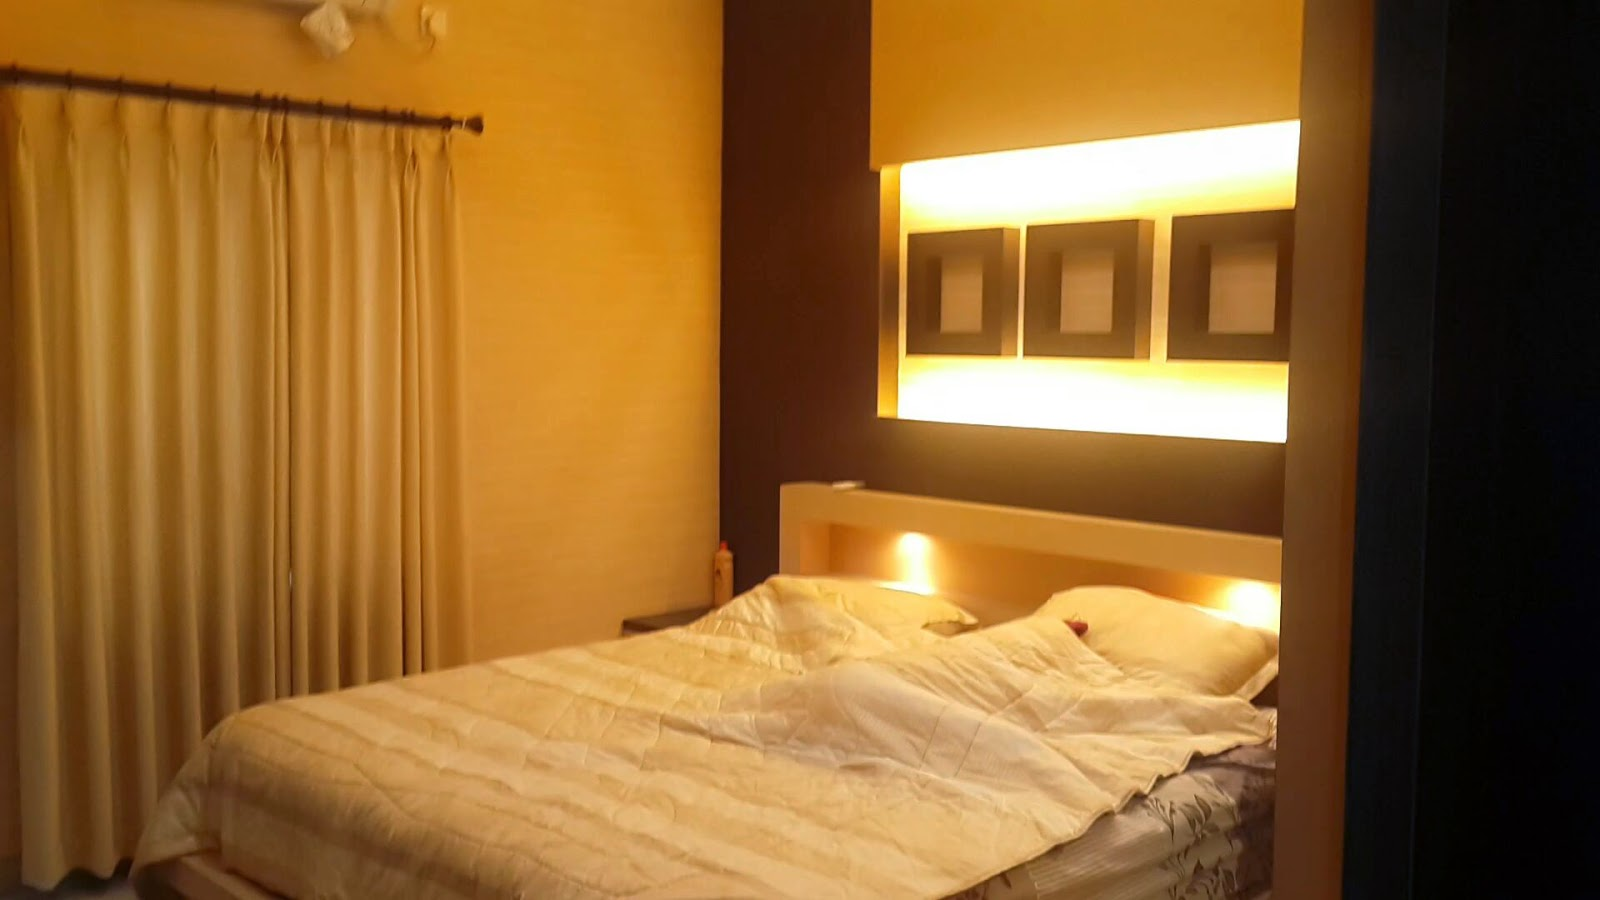 Rumah Dijual di Cluster cassa de esta Cigadung dago atas bandung kamar utama Desember 2014